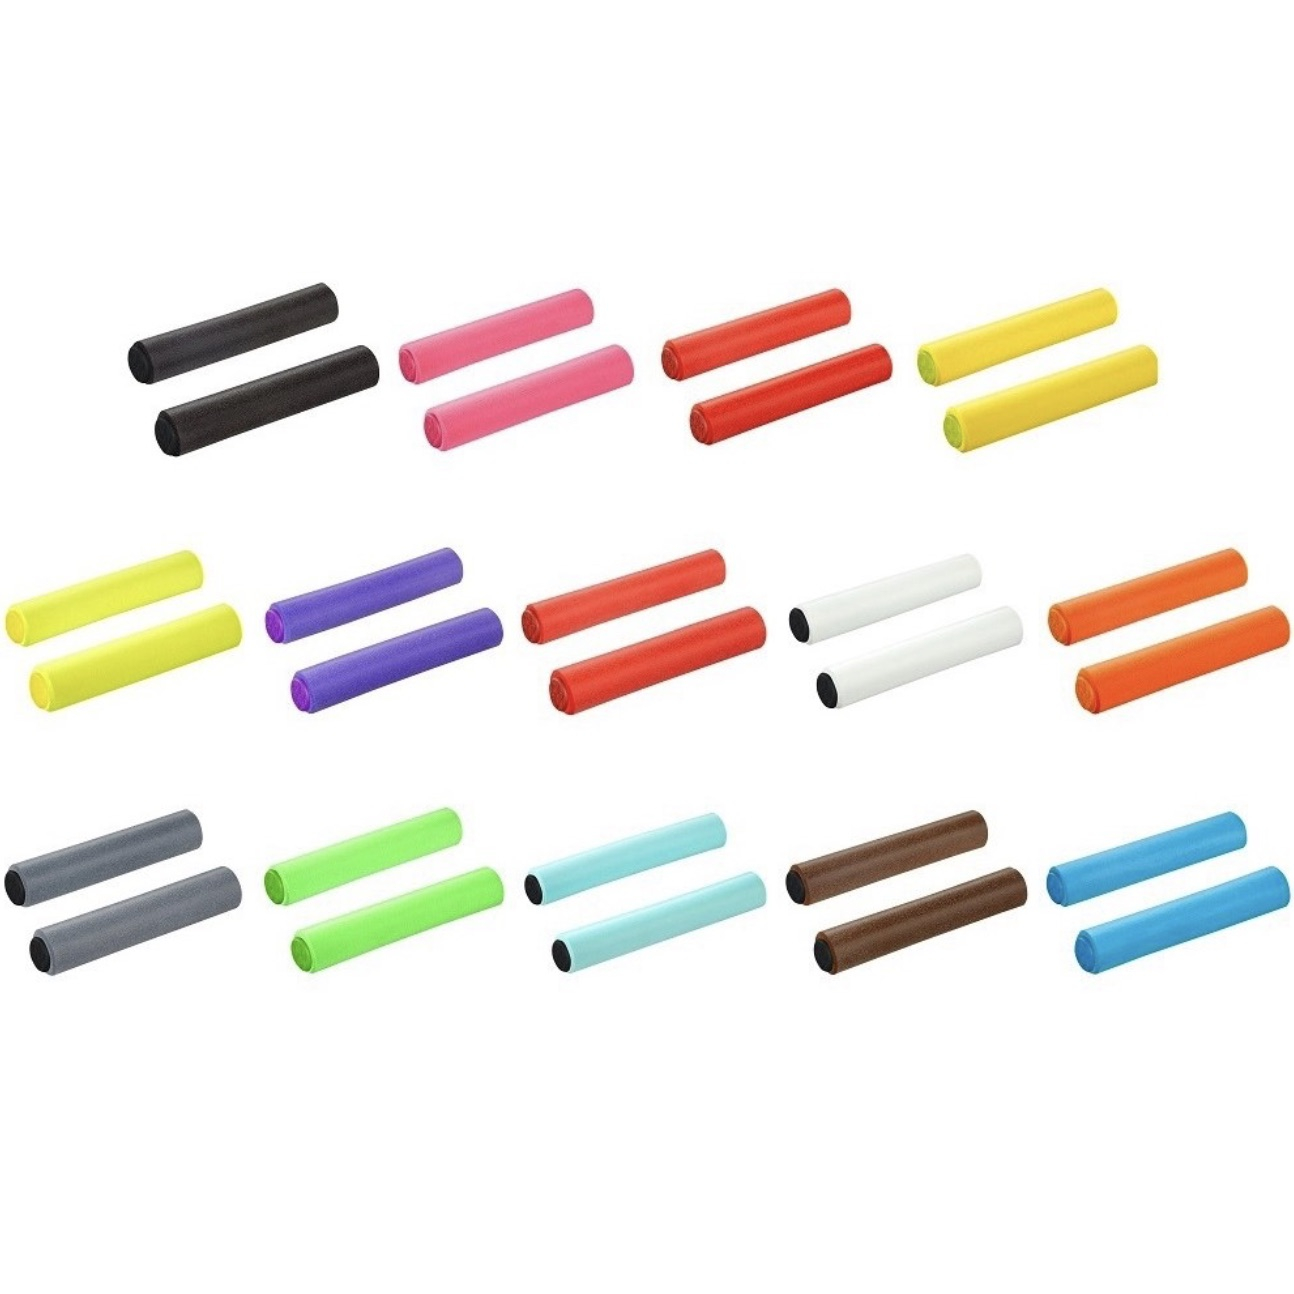 Håndtag Supacaz Siliconez XL silikone 34 mm - SG-xx | Handles